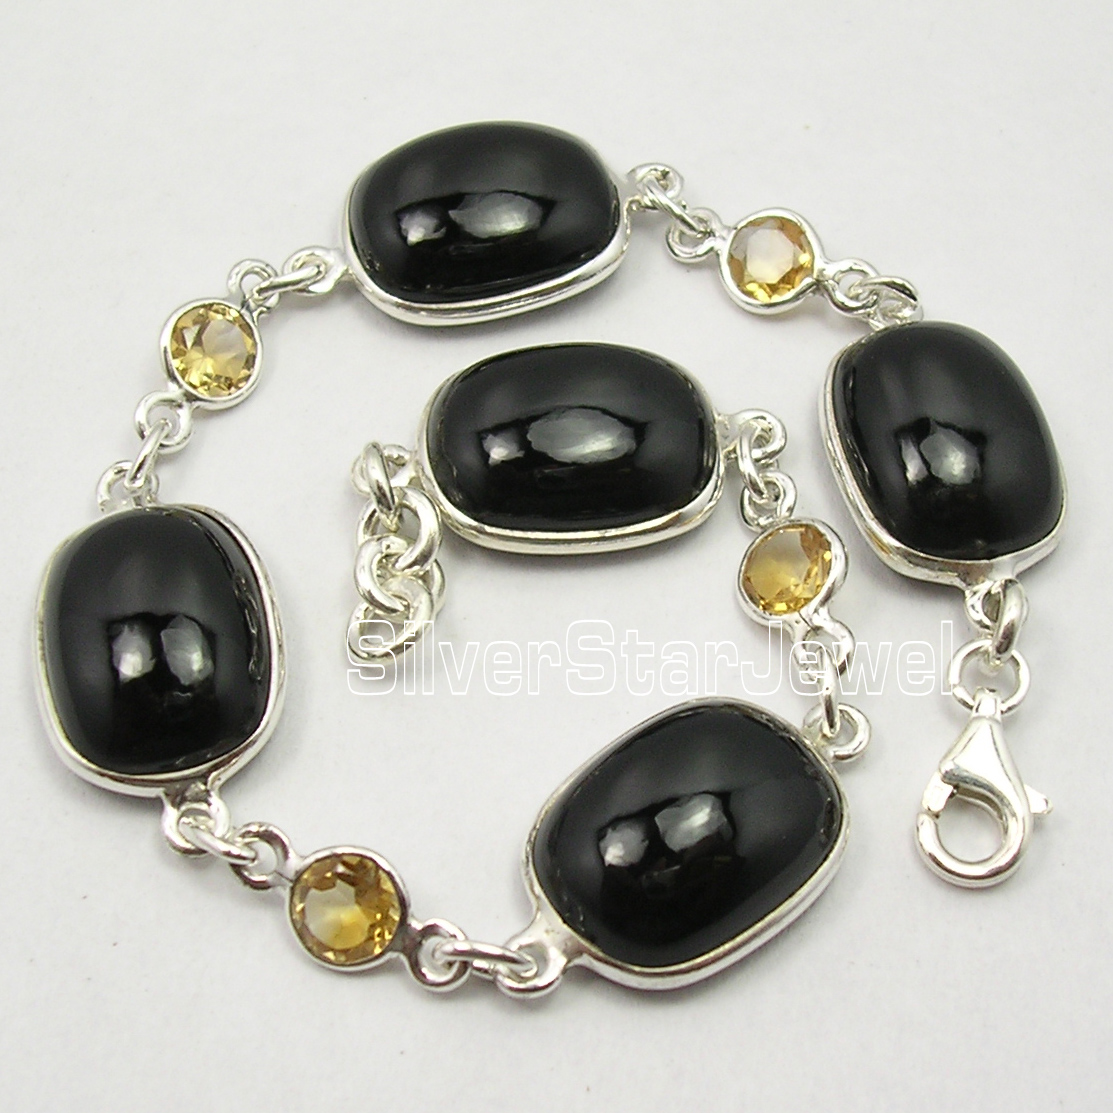 Chanti International Solid Silver Amazing BLACK ONYX & Citrines BESTSELLER Heavy Bracelet 8 3/8